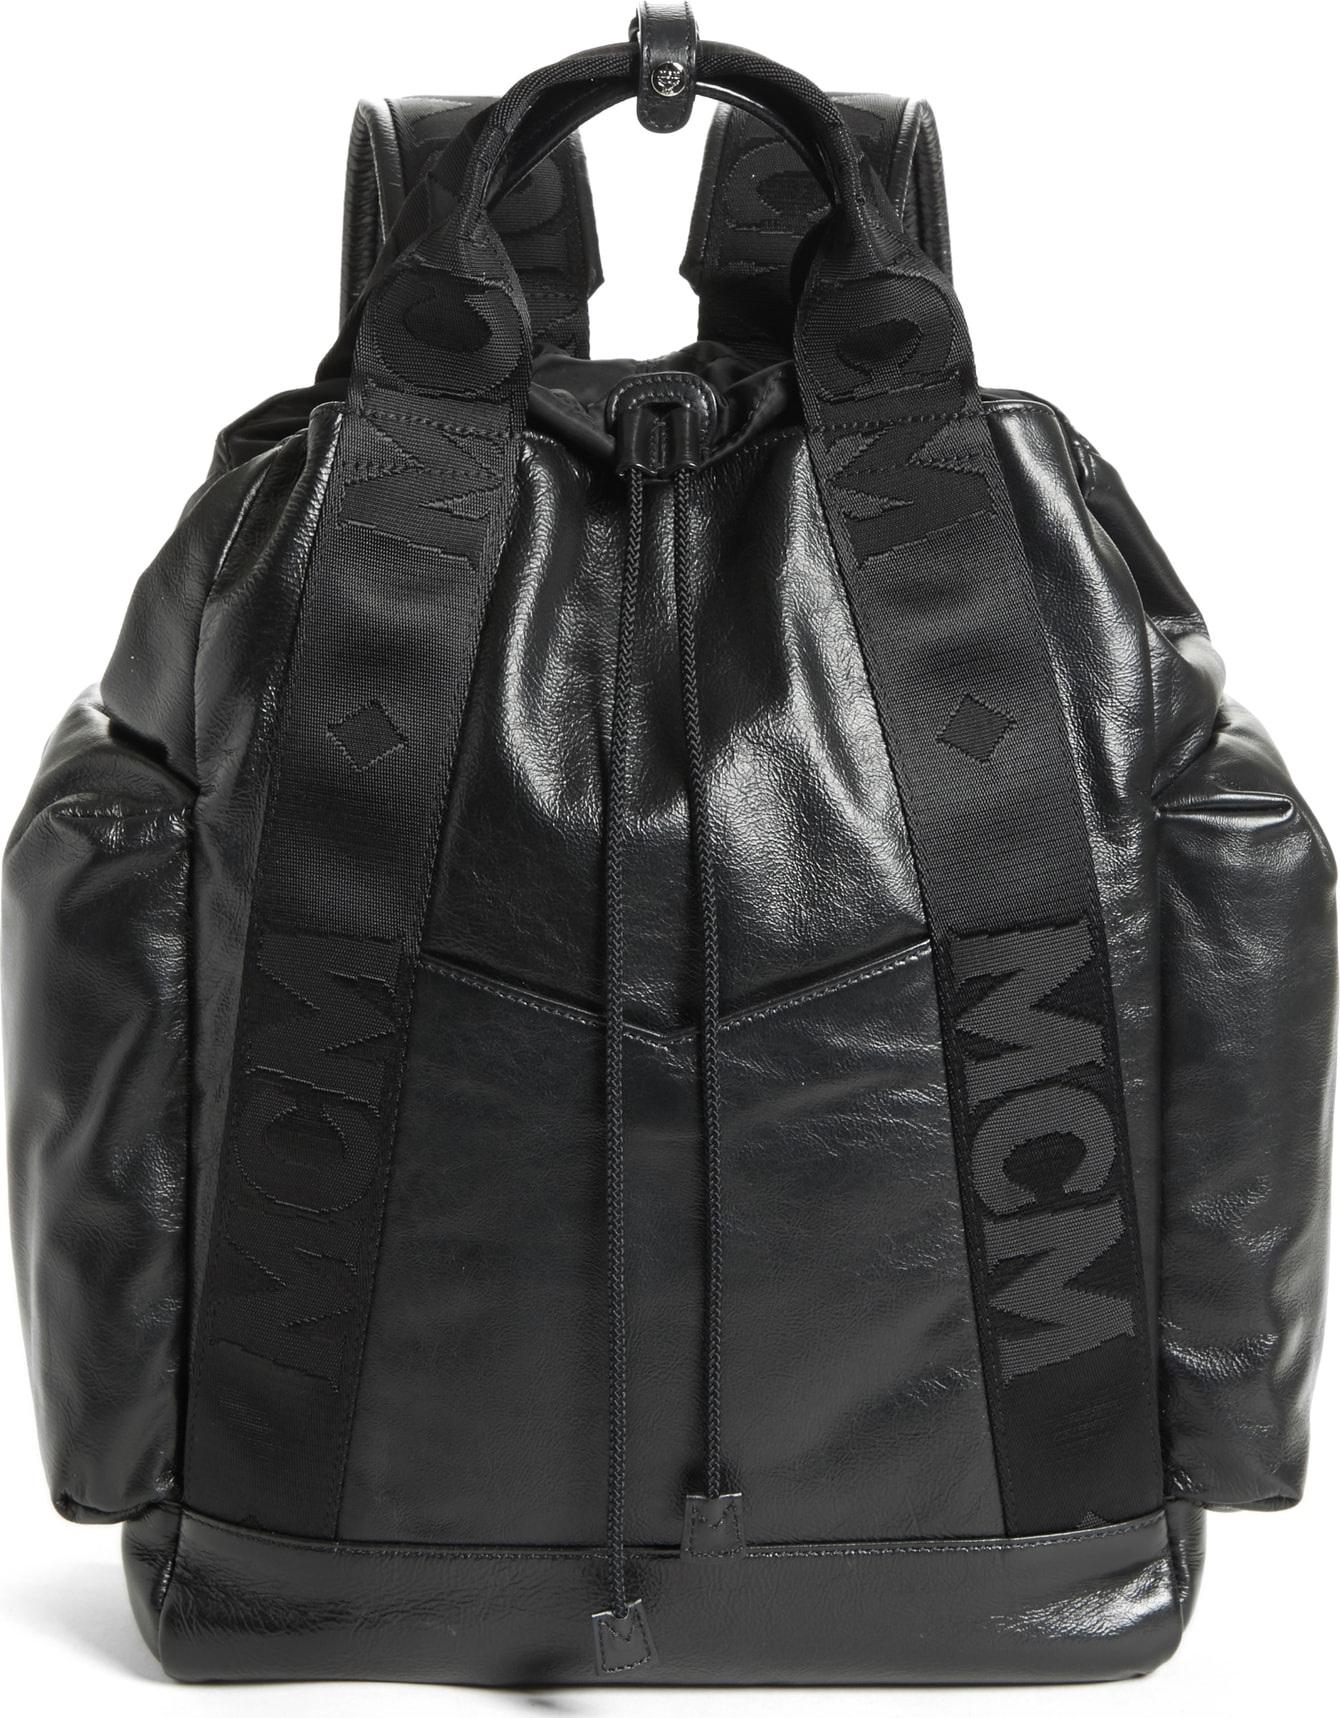 bbe9d955a8777 Mcm Black Studded Backpack- Fenix Toulouse Handball